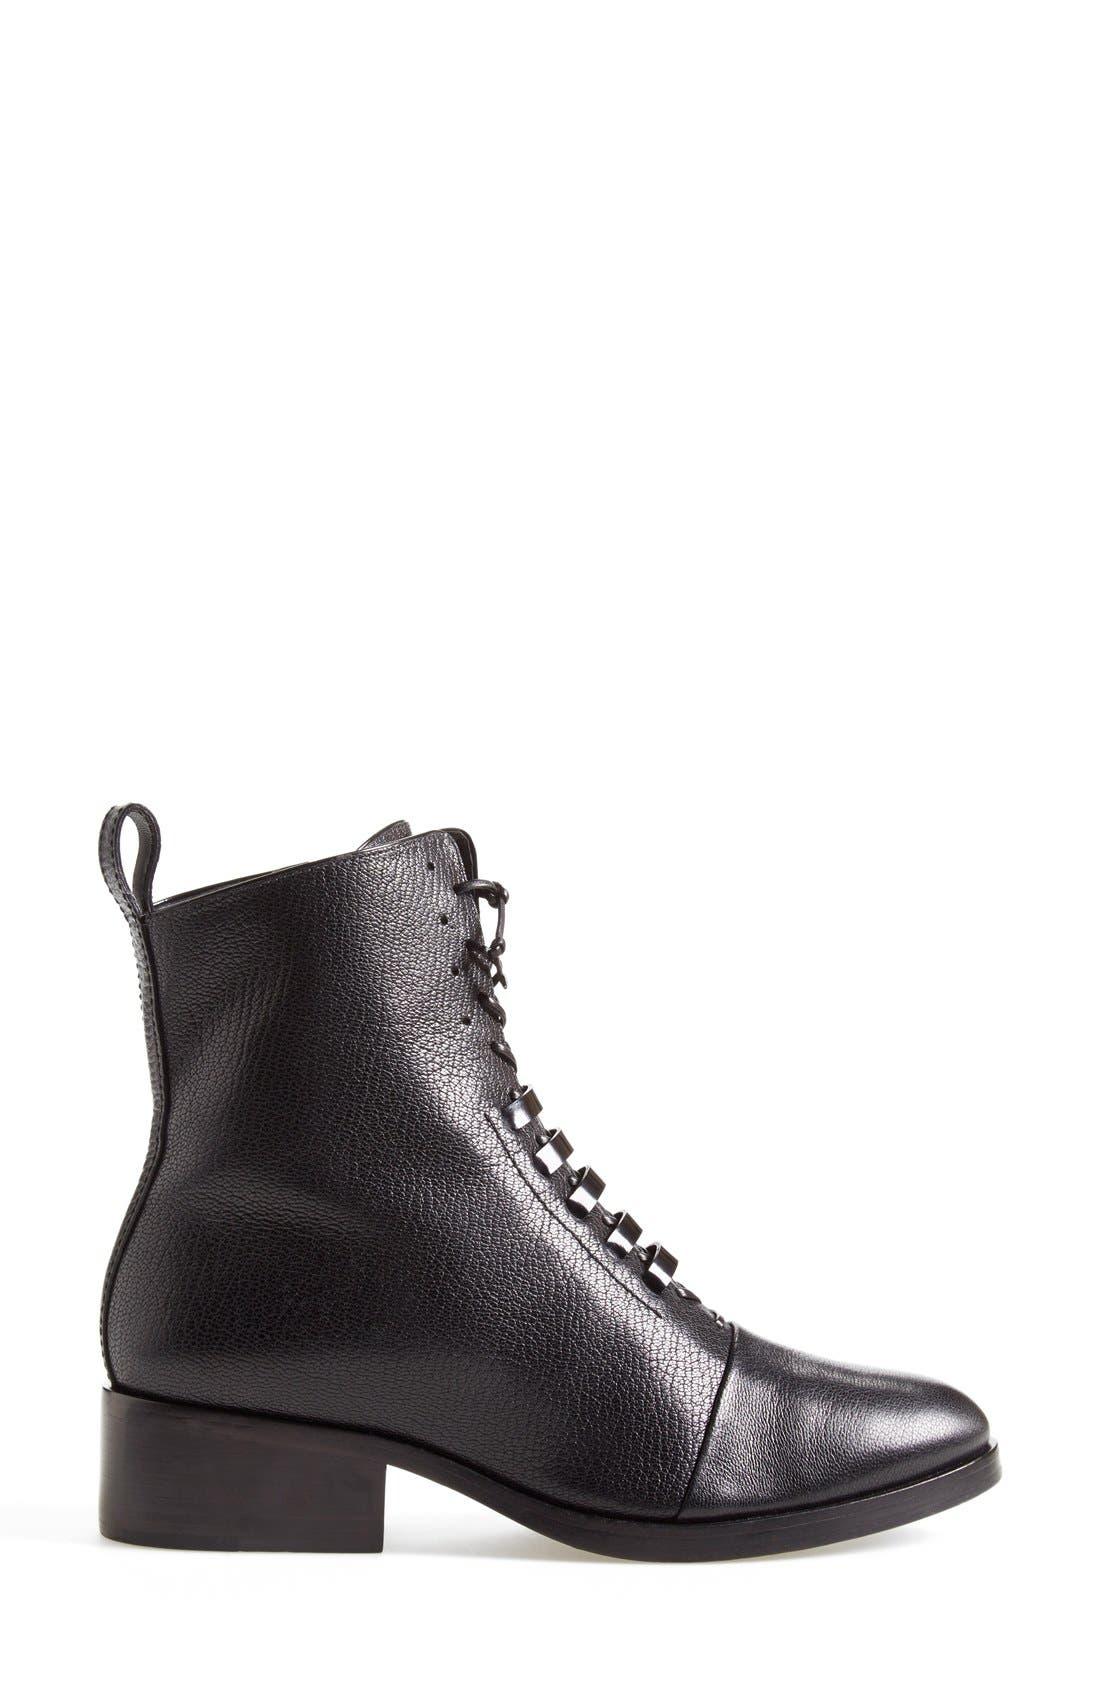 Alternate Image 4  - 3.1 Phillip Lim 'Alexa' Lace-Up Ankle Boot (Women)